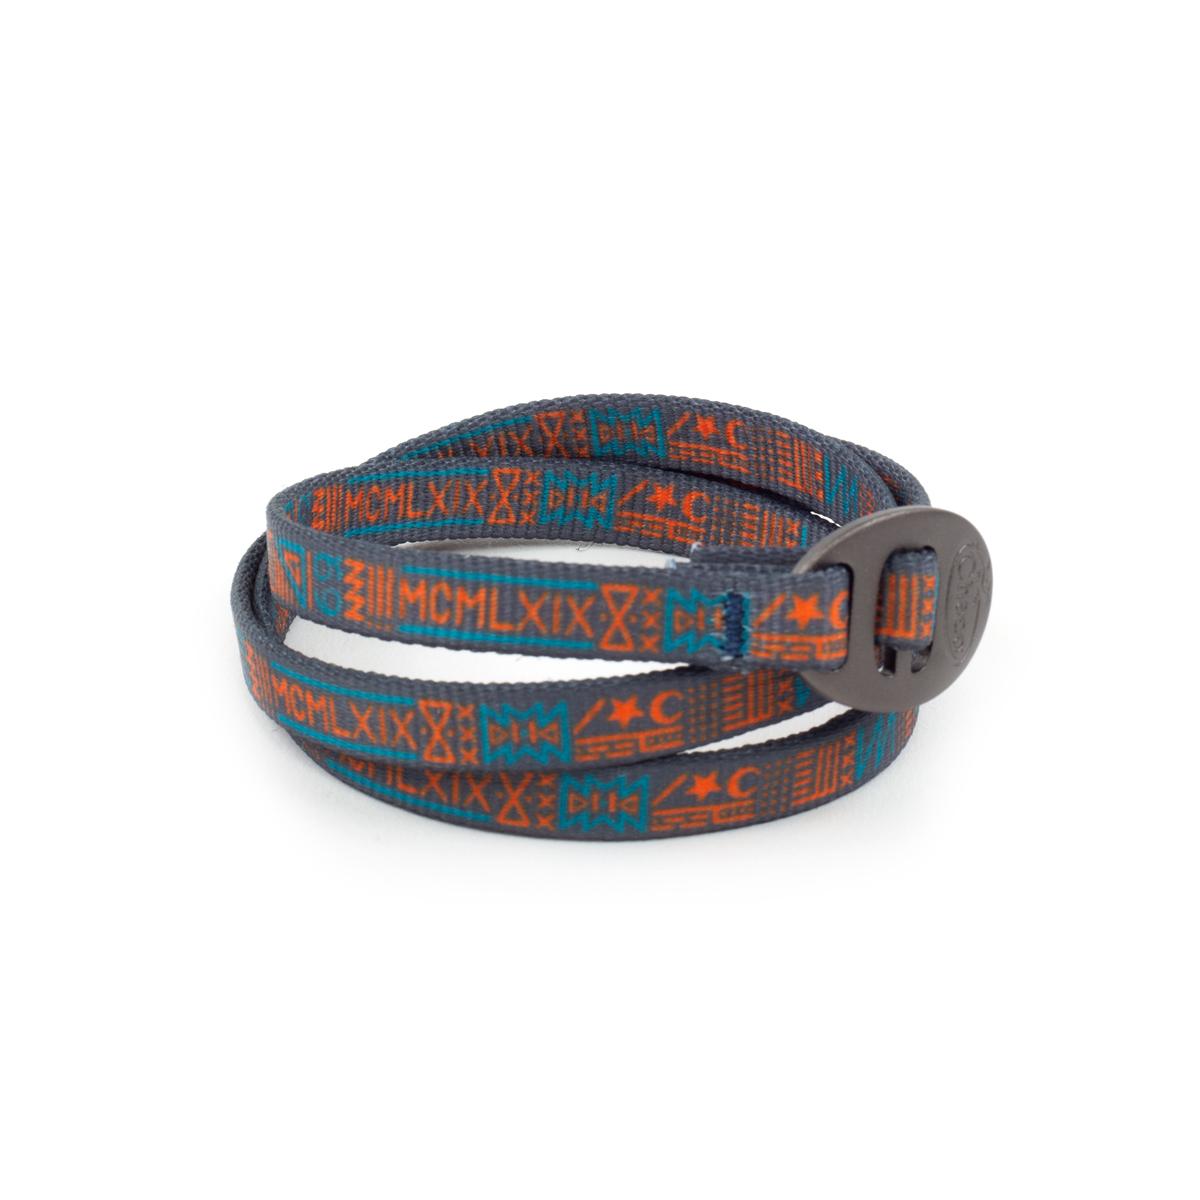 Chaco Wrist Band (Blue and Orange)